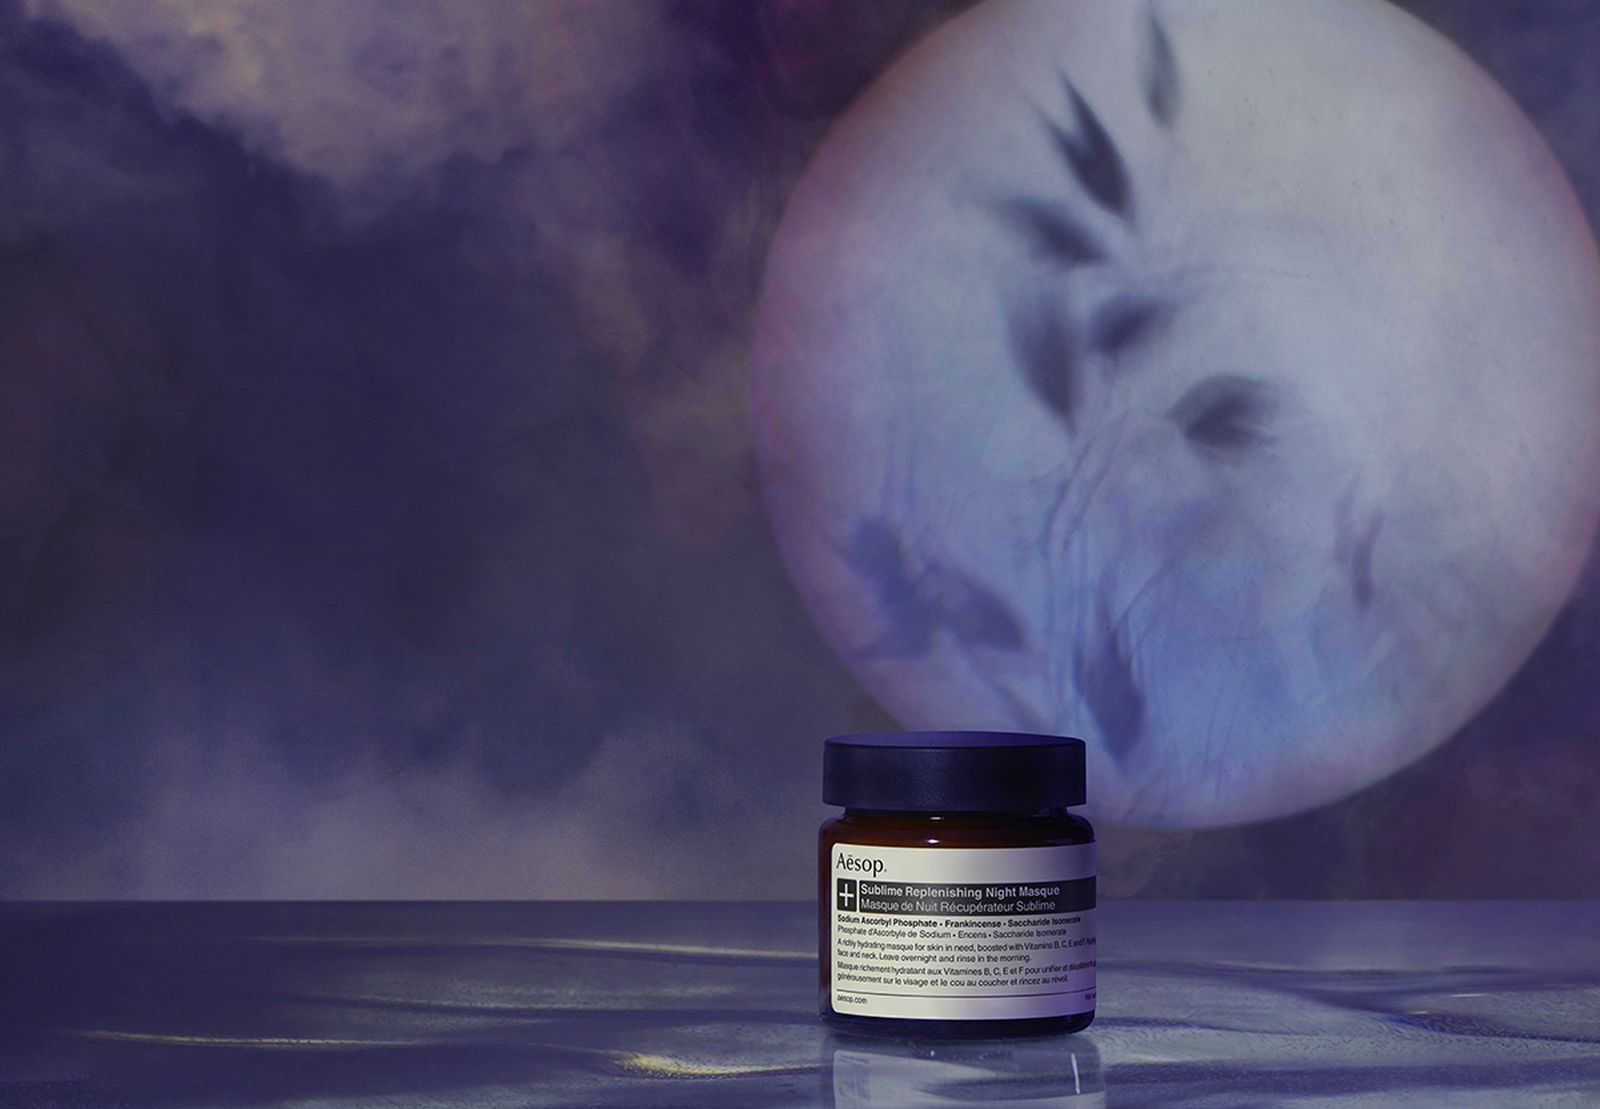 Aesop-Sublime-Replenishing-Night-Masque-01